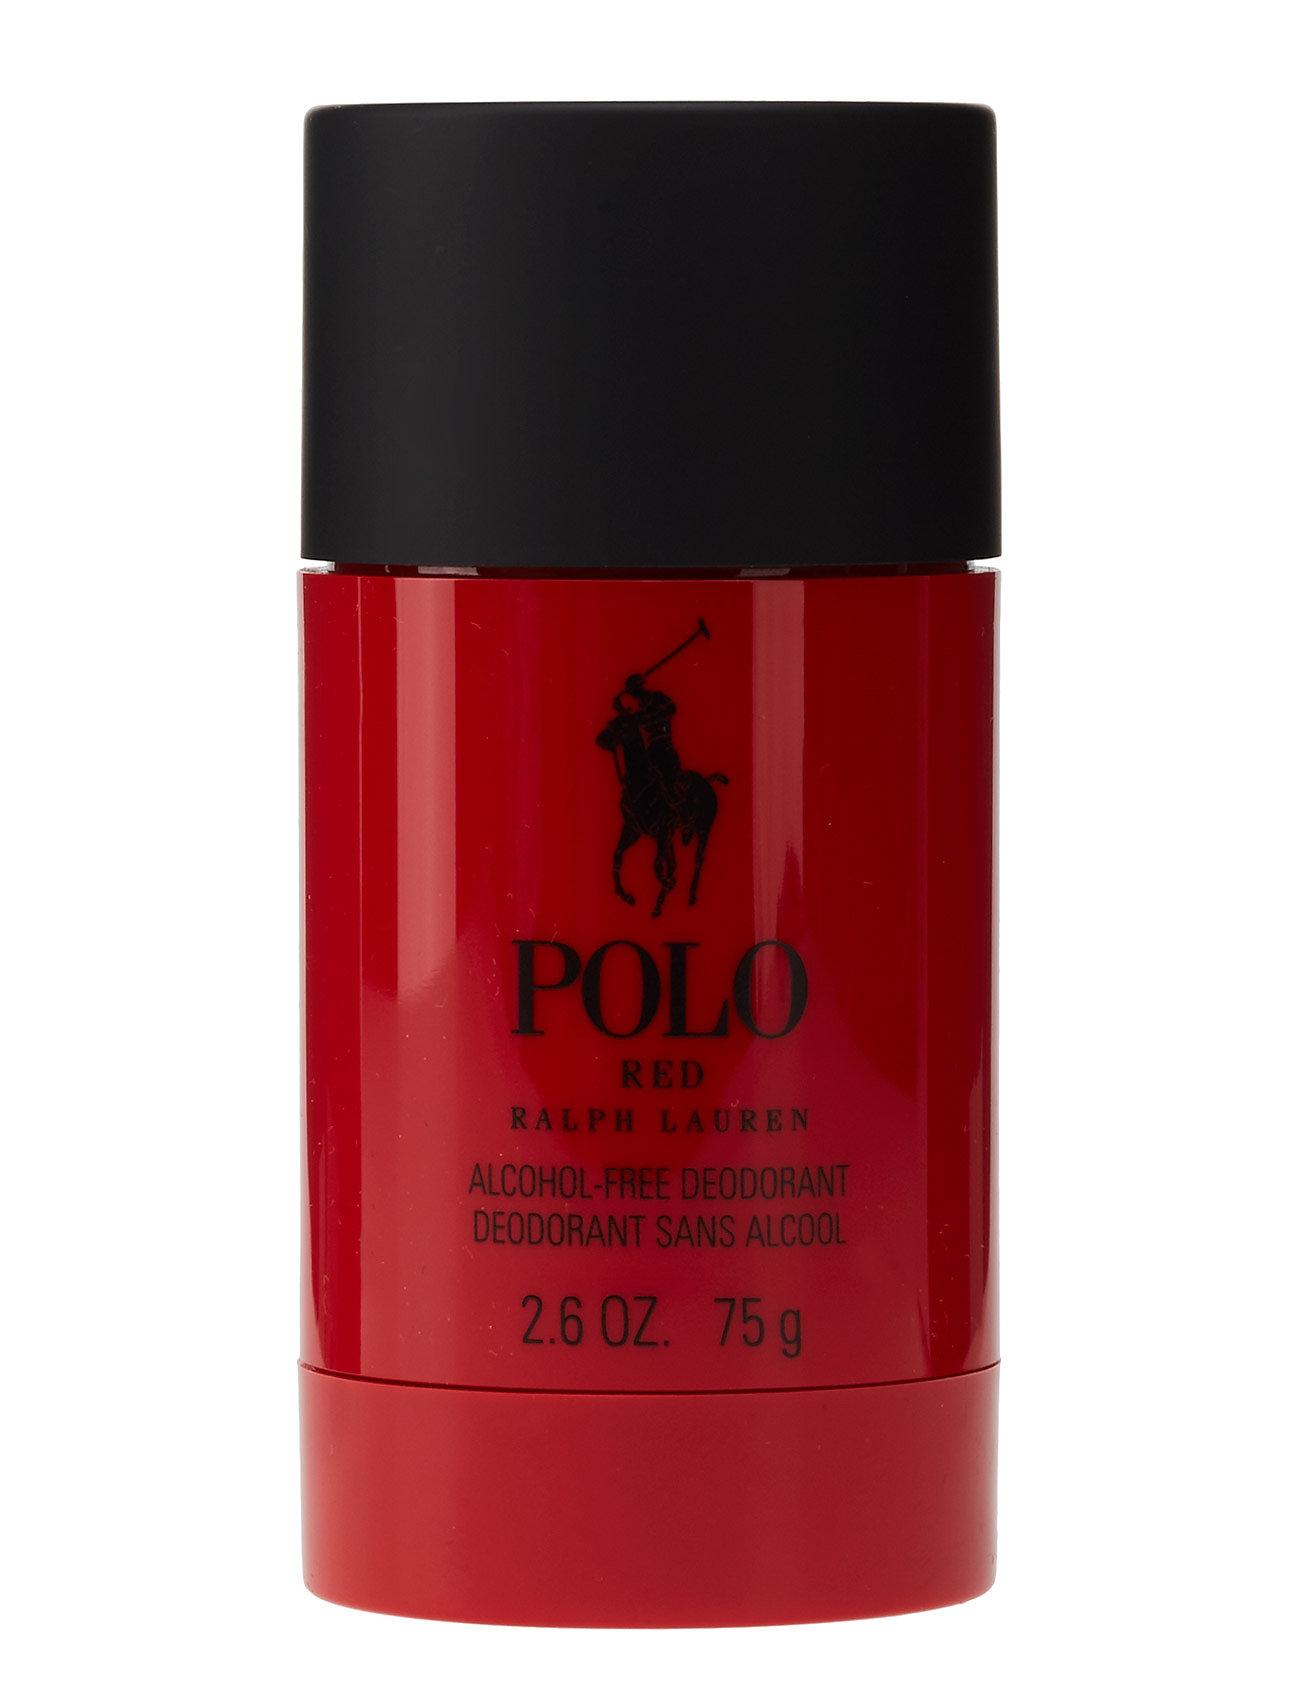 Image of Polo Red Beauty MEN Deodorants Sticks Nude Ralph Lauren - Fragrance (2904528259)